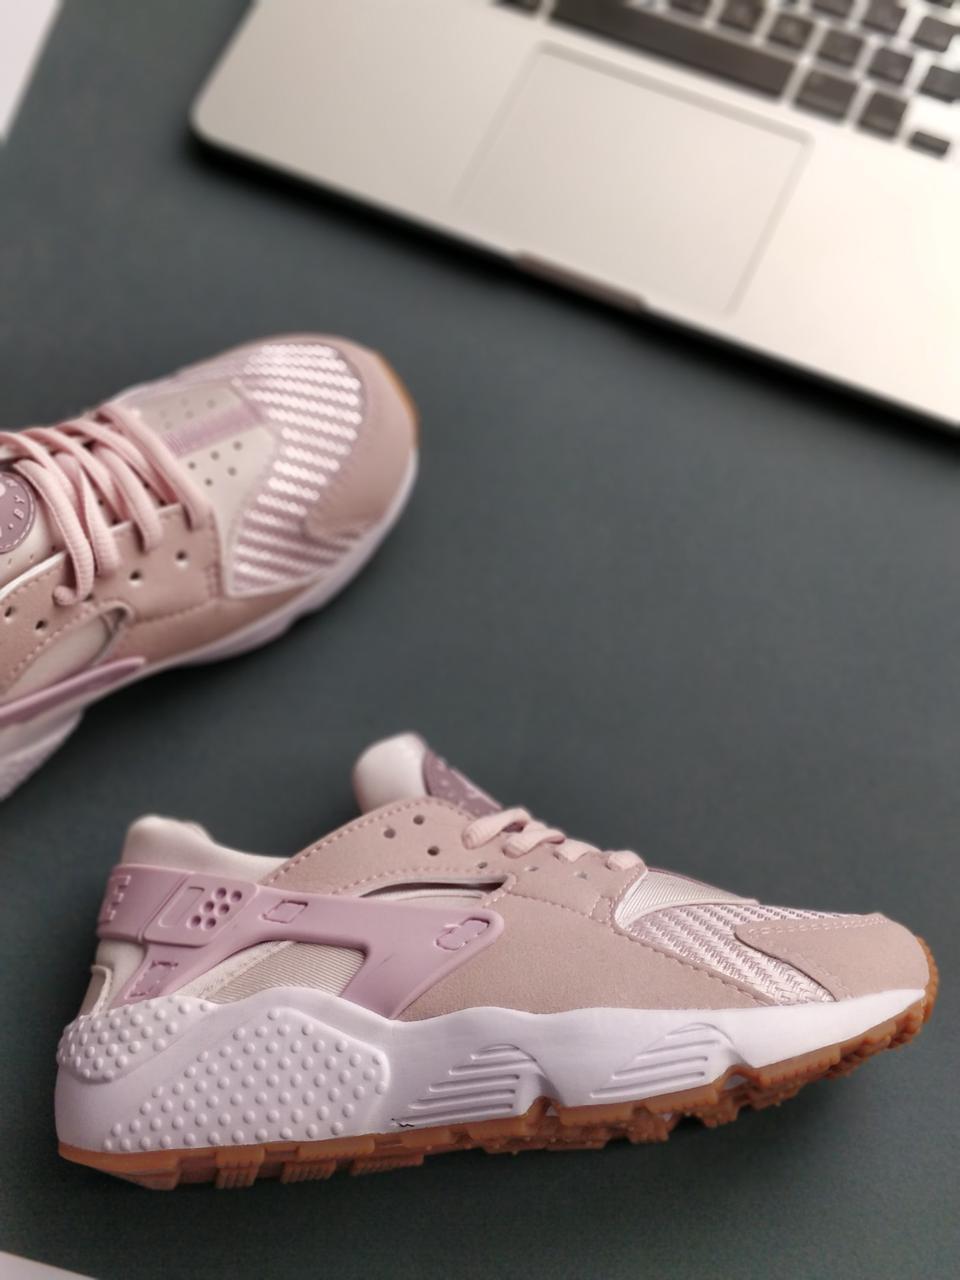 15134ad9 Женские кроссовки Nike Air Huarache Run Premium Pink (ТОП РЕПЛИКА ААА+)